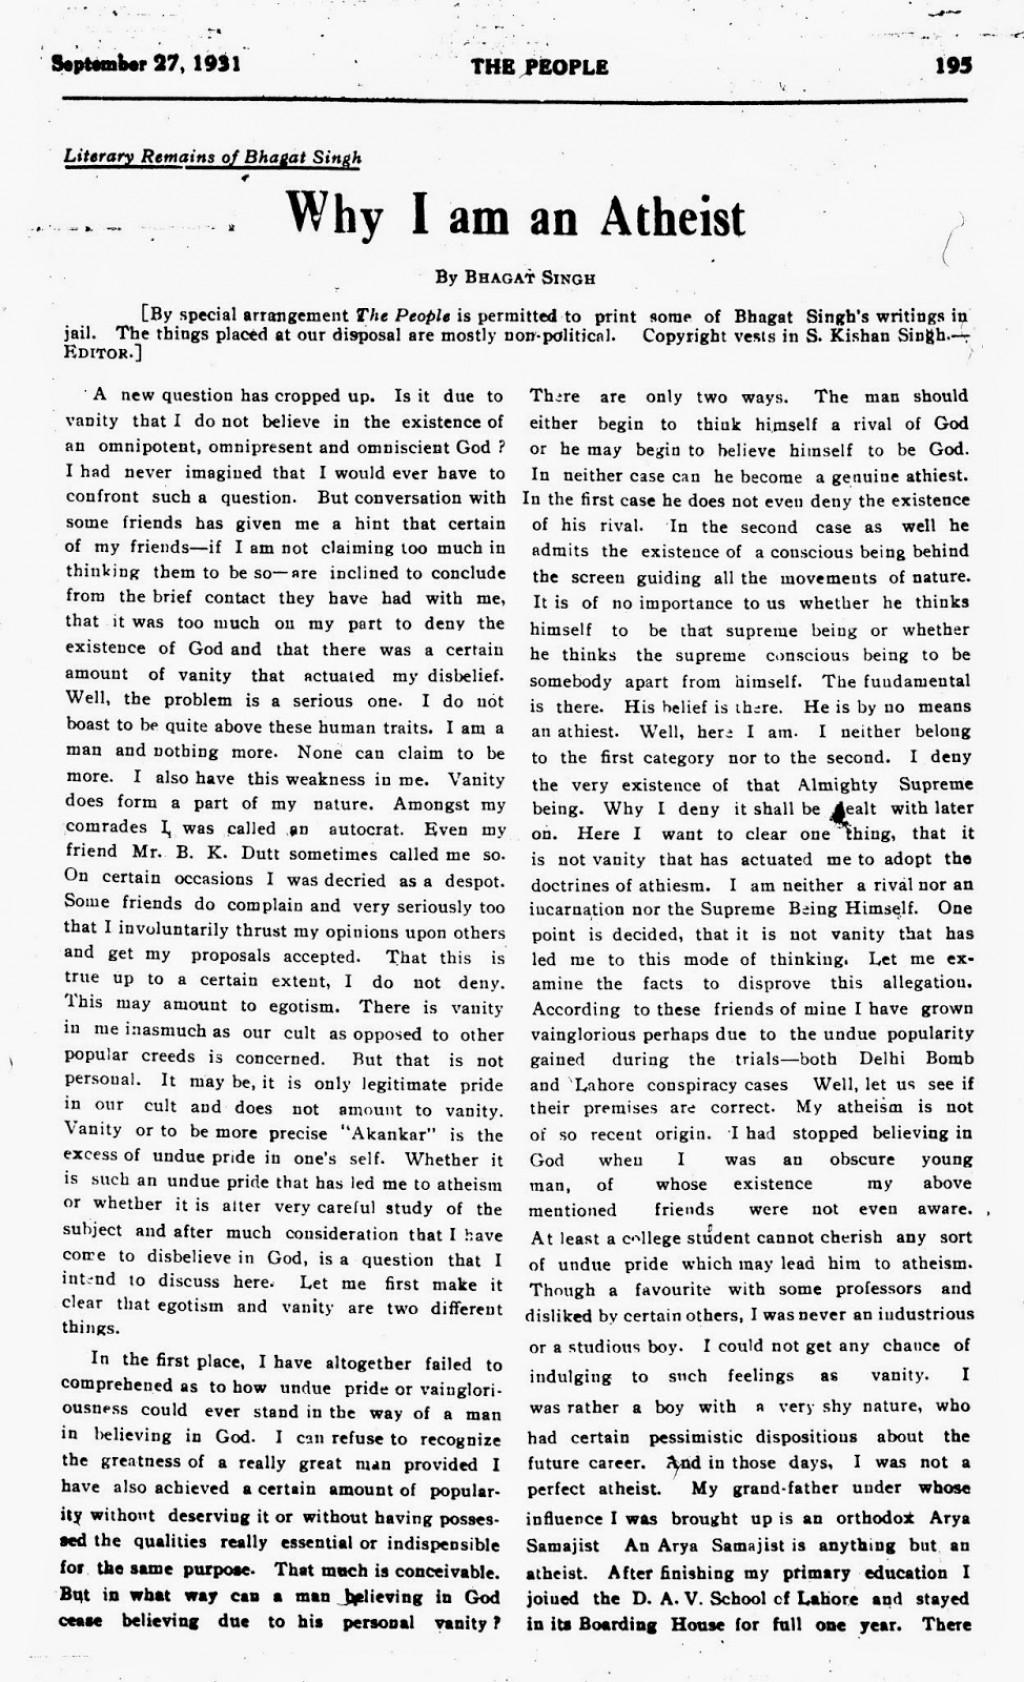 010 Essay On Bhagat Singh In Marathi Example Why2bi2bam2ban2batheist Unique Short 100 Words Large